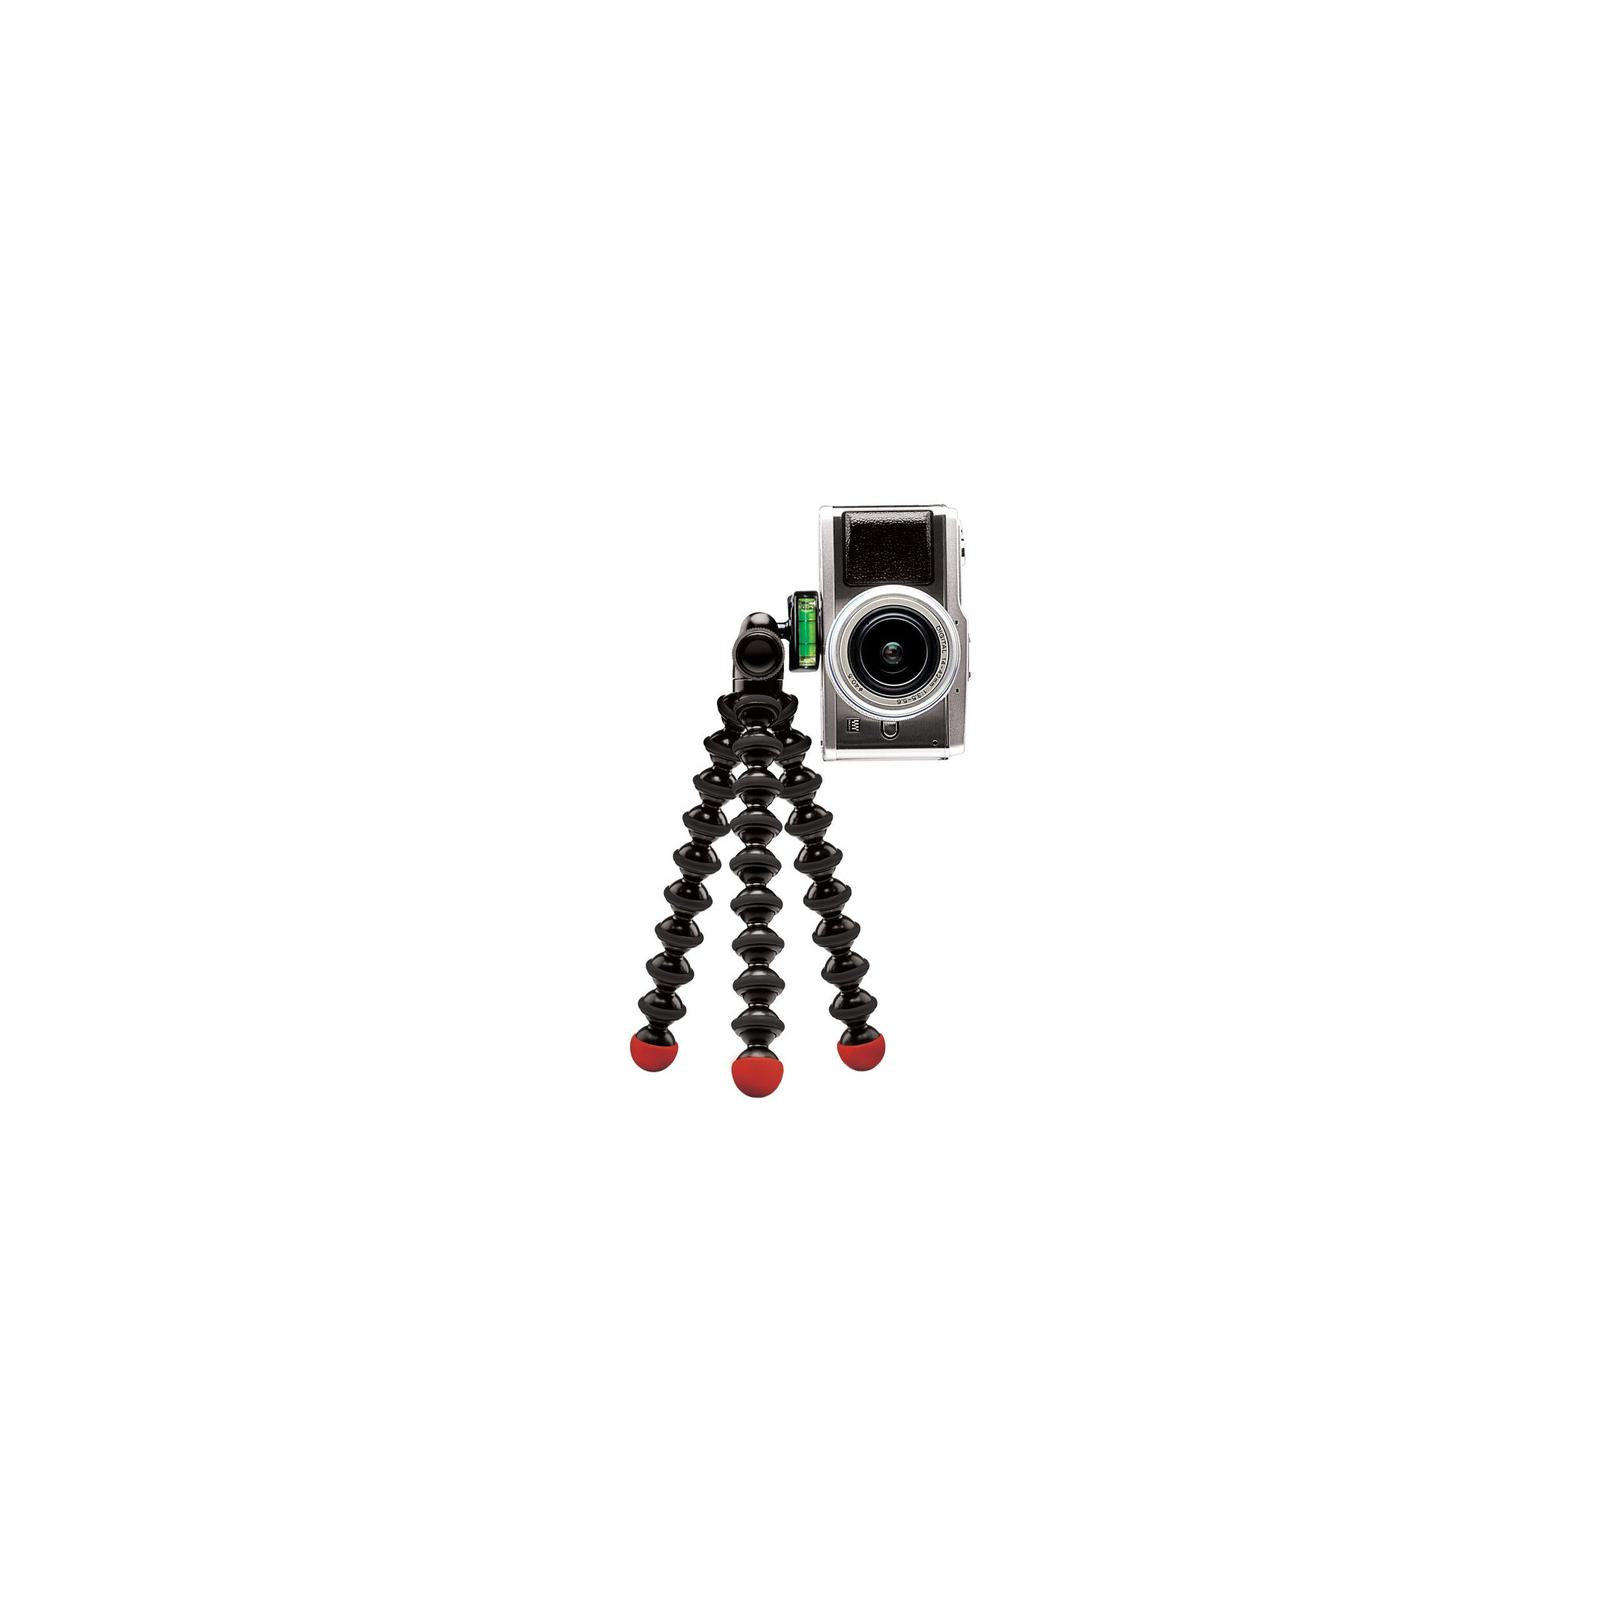 Штатив JOBY GorillaPod Hybrid Eco (Black/Red) (JB01081-0EU)